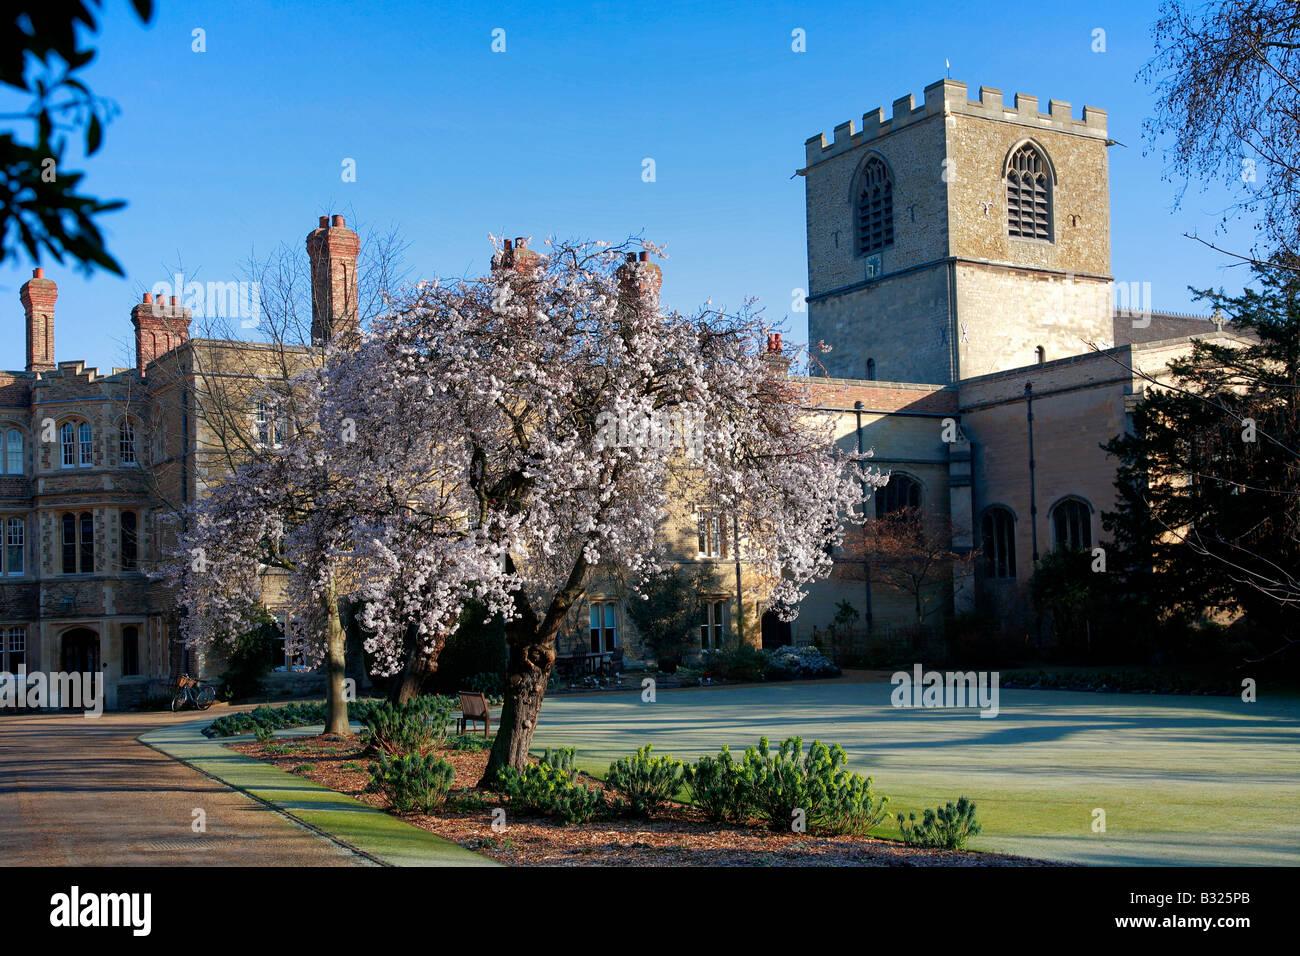 Jesus College entrance gate Chapel and Cloisters University of Cambridge City Cambridgeshire England Britain UK - Stock Image